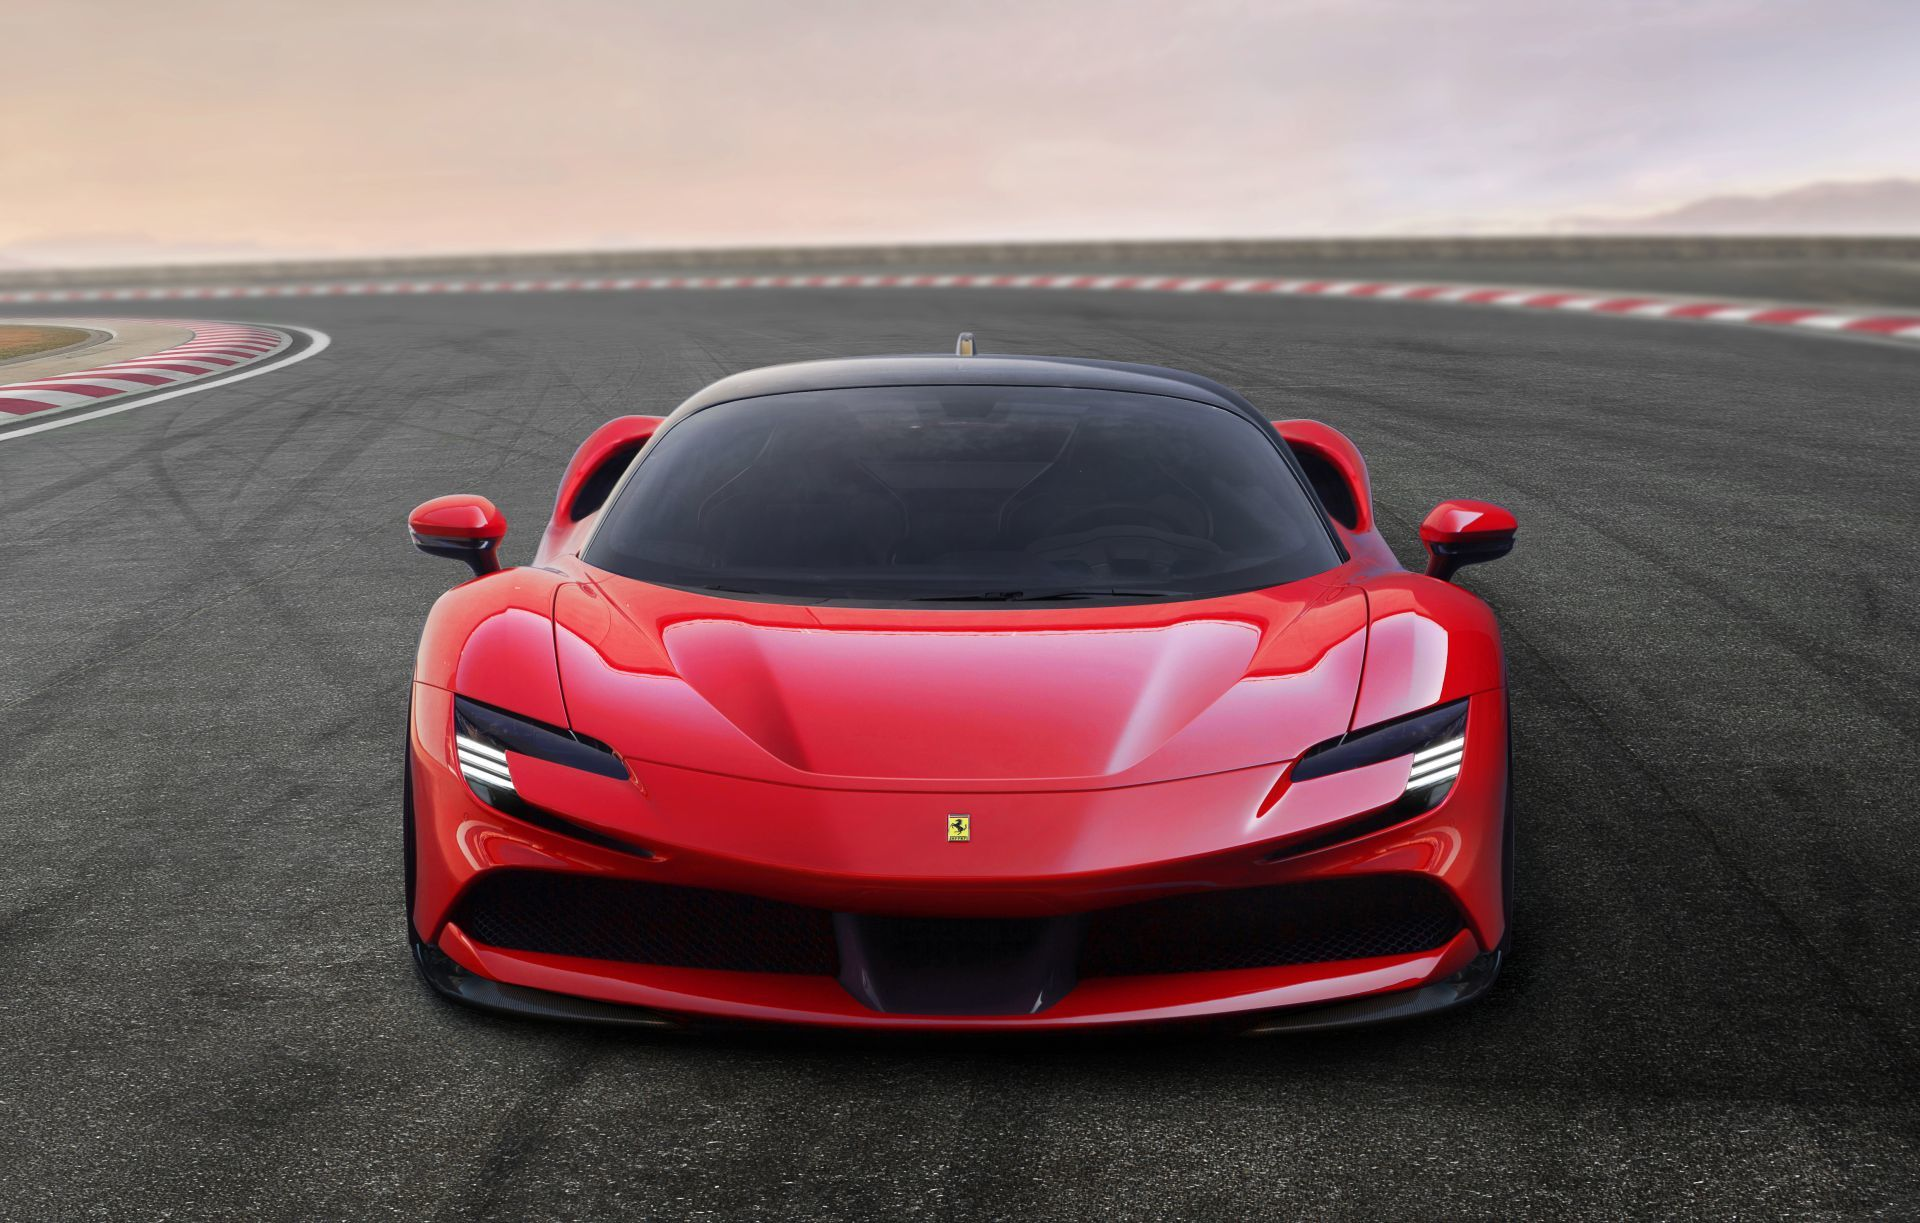 Ferrari Sf90 Stradale 2020 4